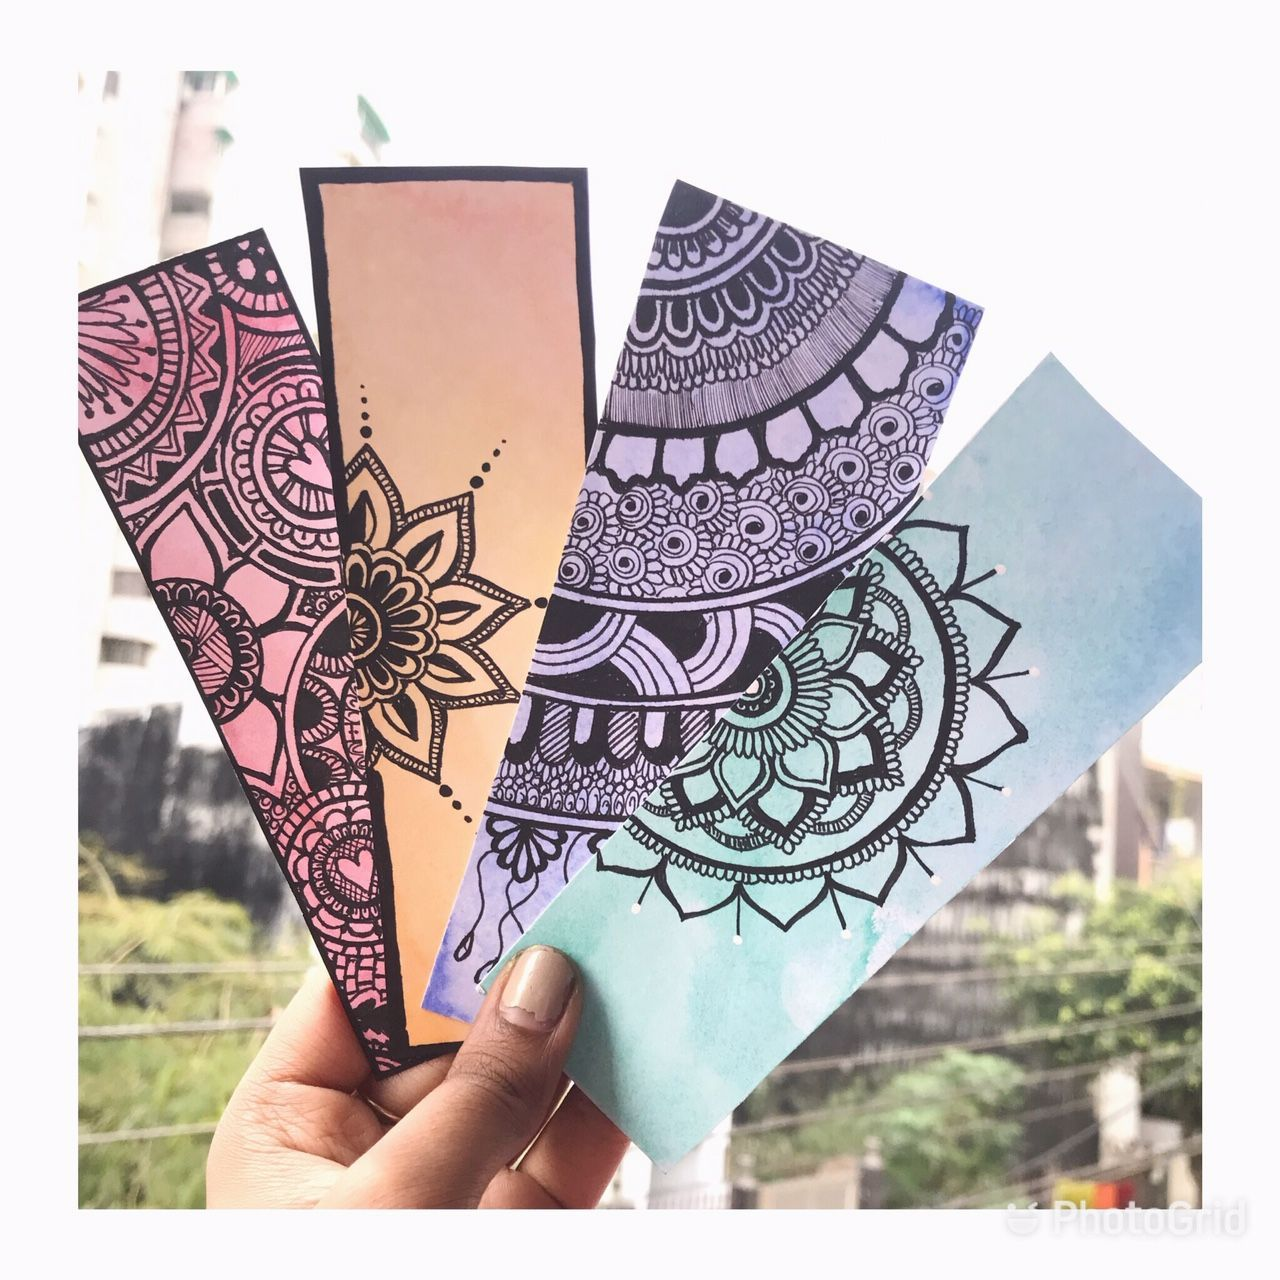 Handmade Diy Bookmark Designs And Ideas Bookmarks Handmade Mandala Design Art Bookmark Craft